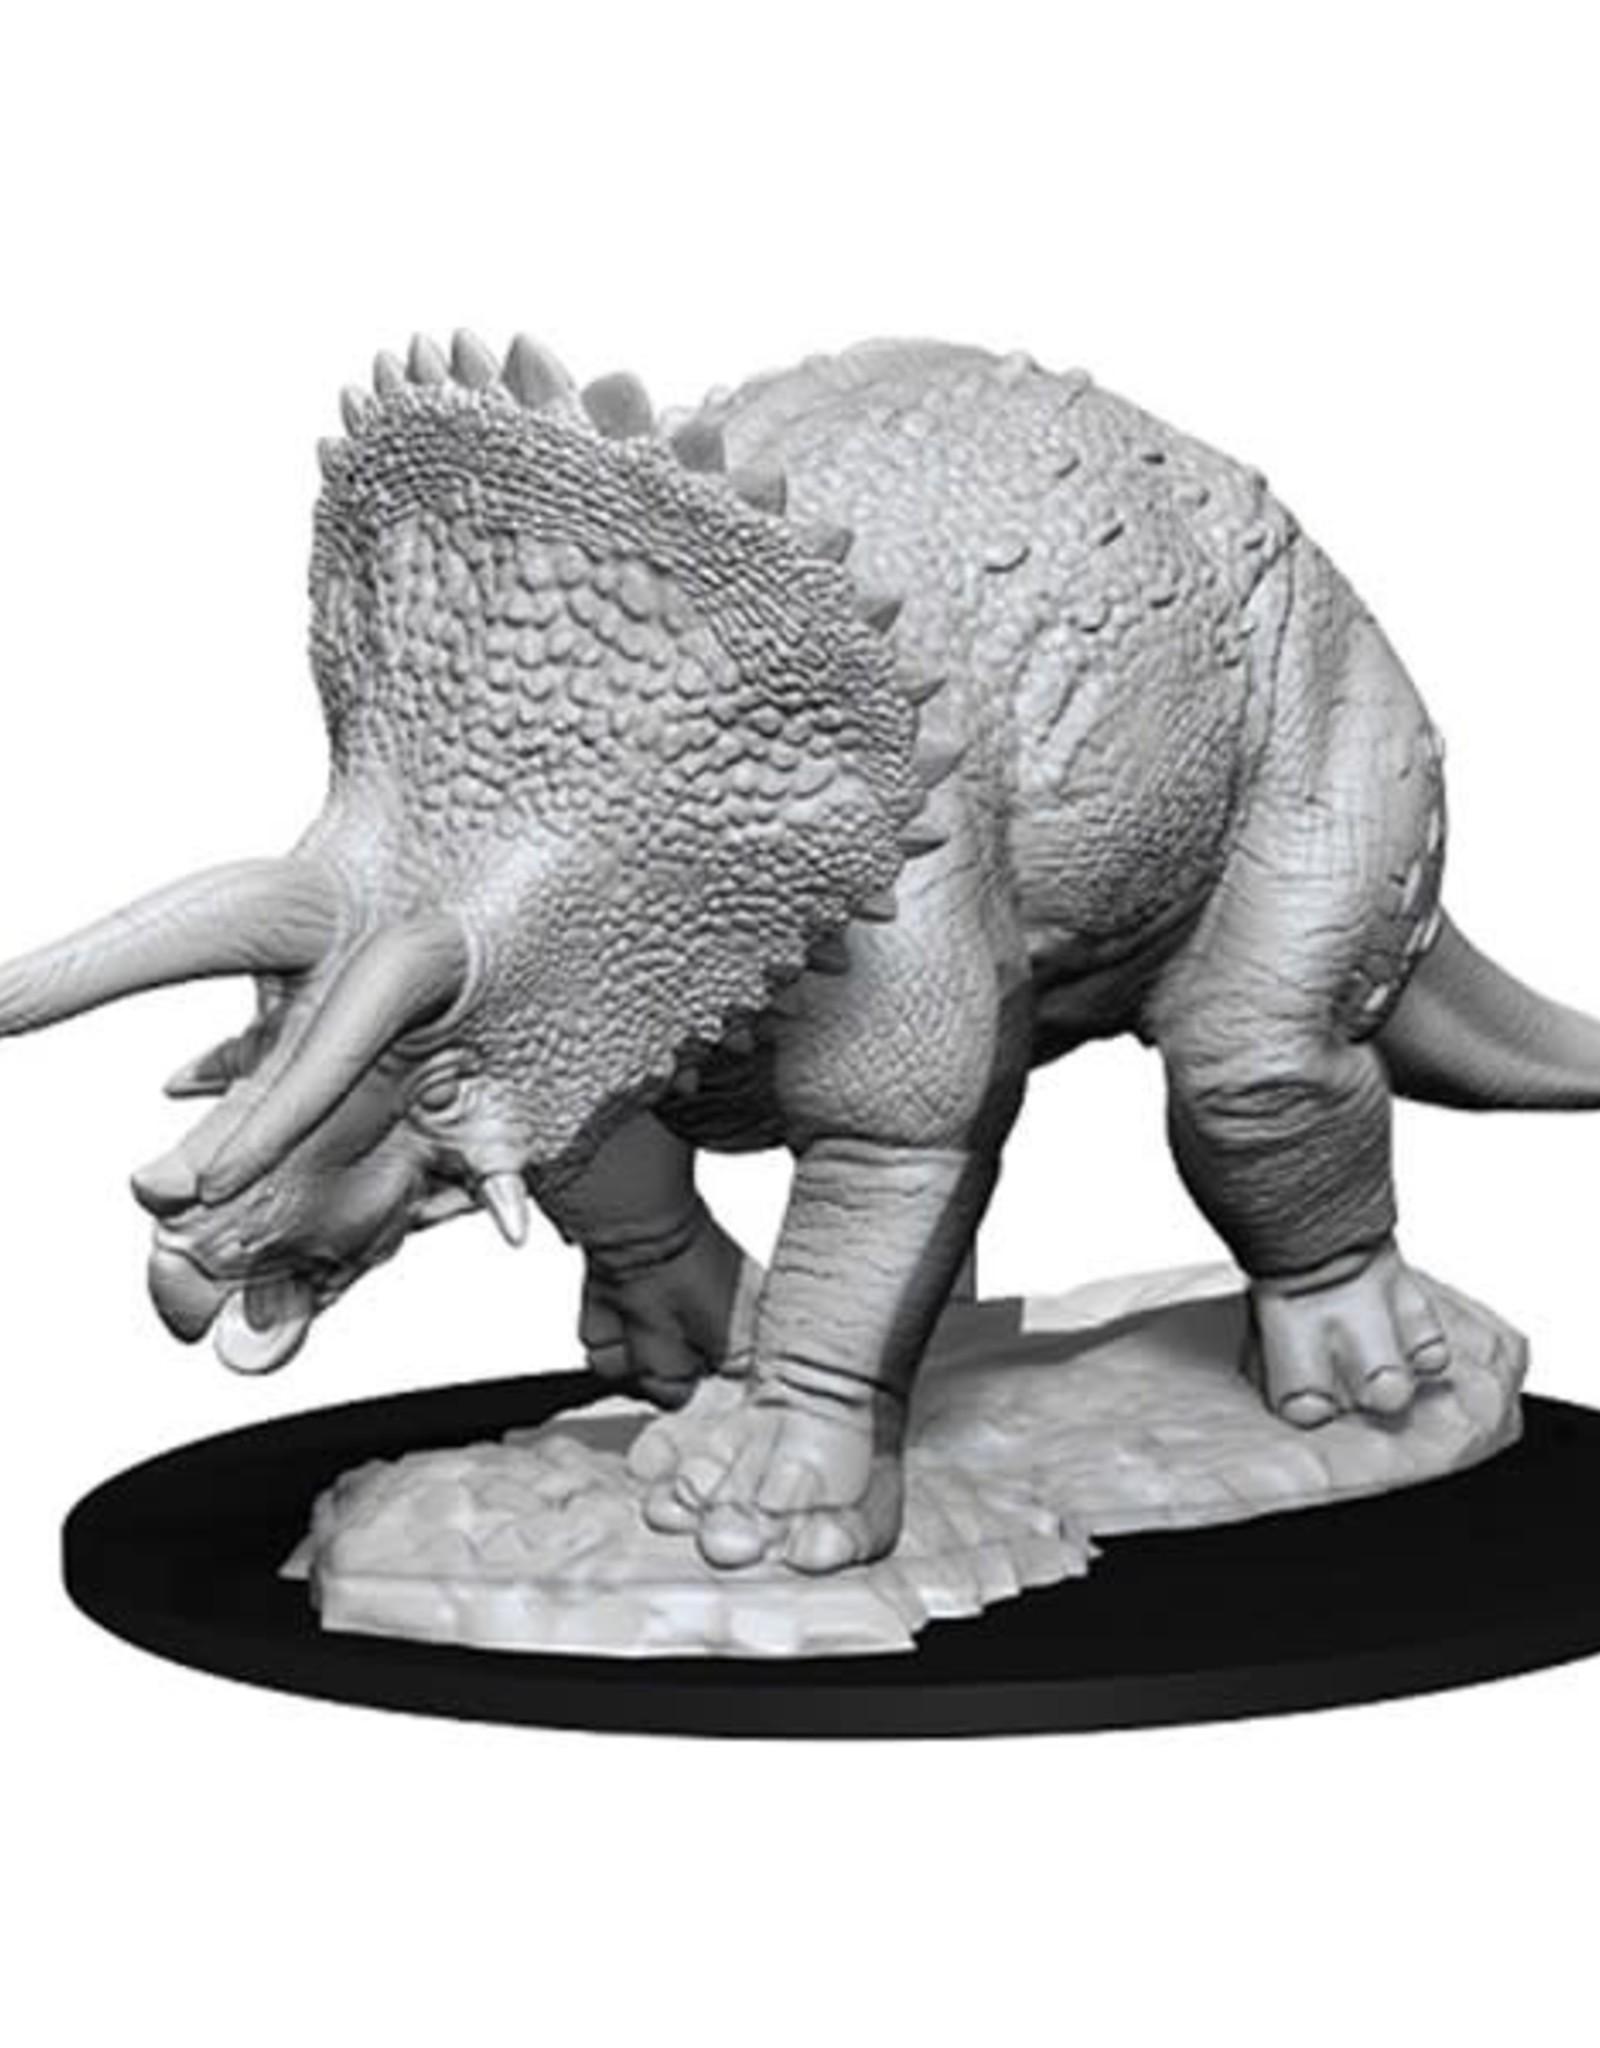 D&D Mini's: Triceratops